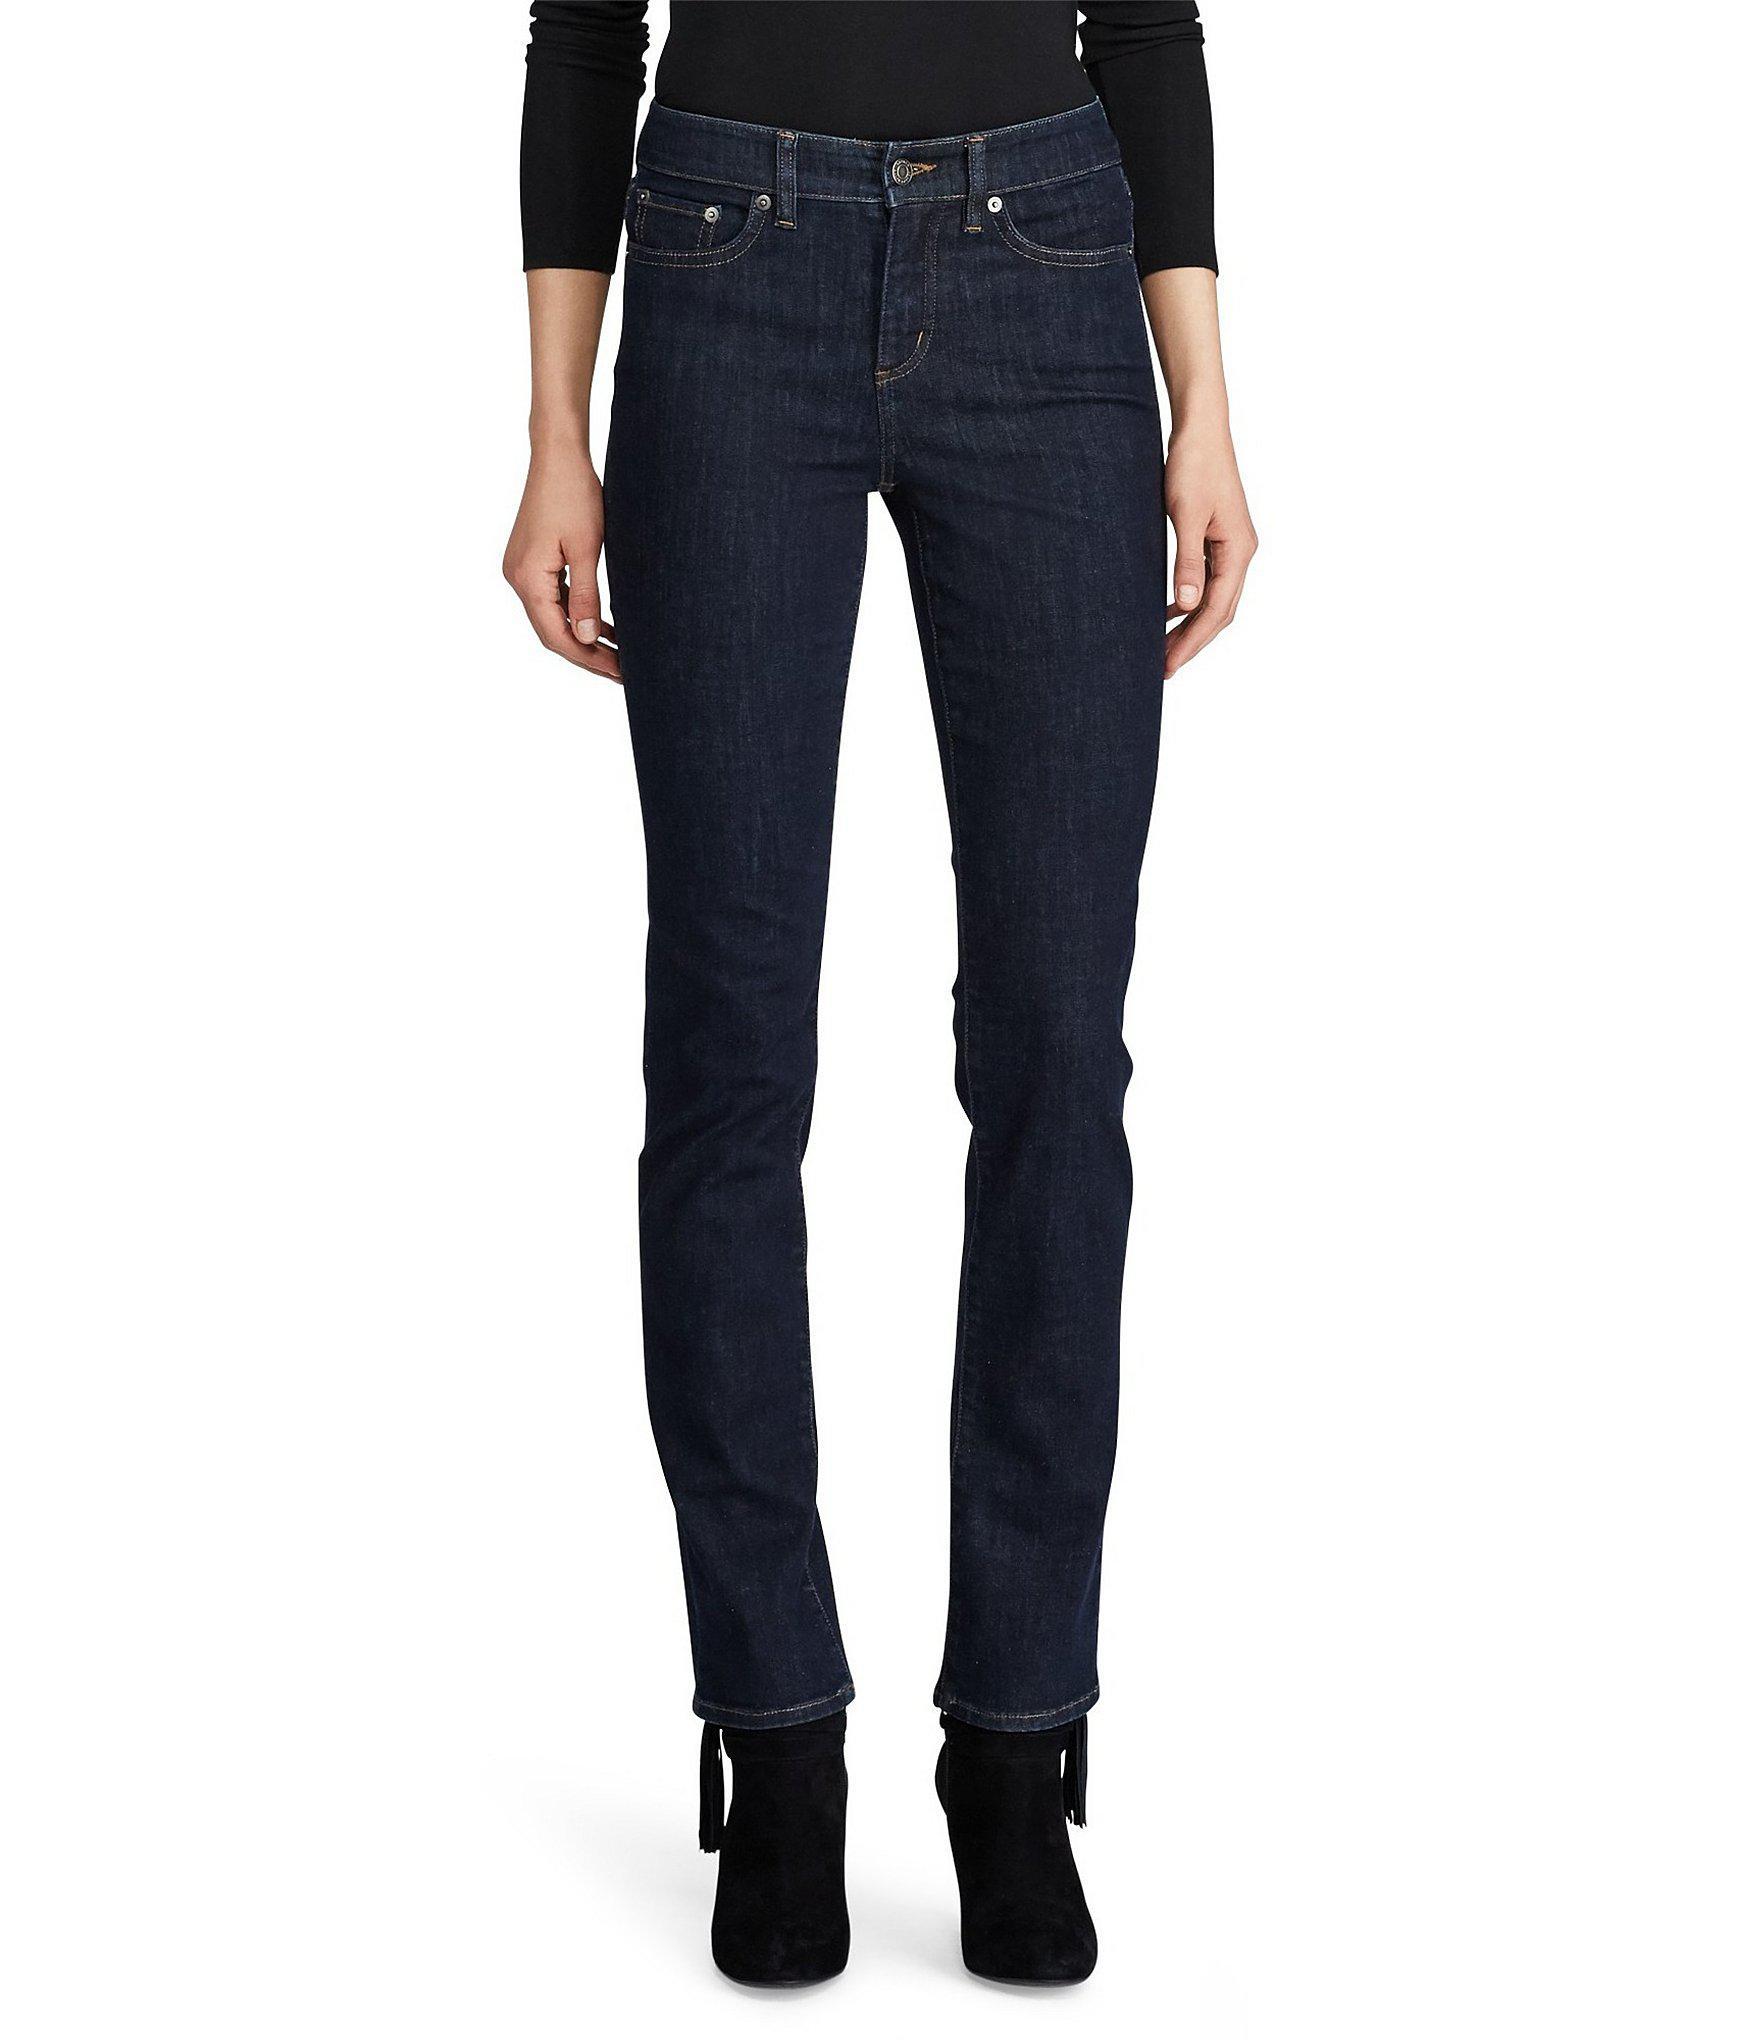 17d1f997a49 Lauren by Ralph Lauren. Women s Blue Ultimate Slimming Premier Straight  Curvy Jeans